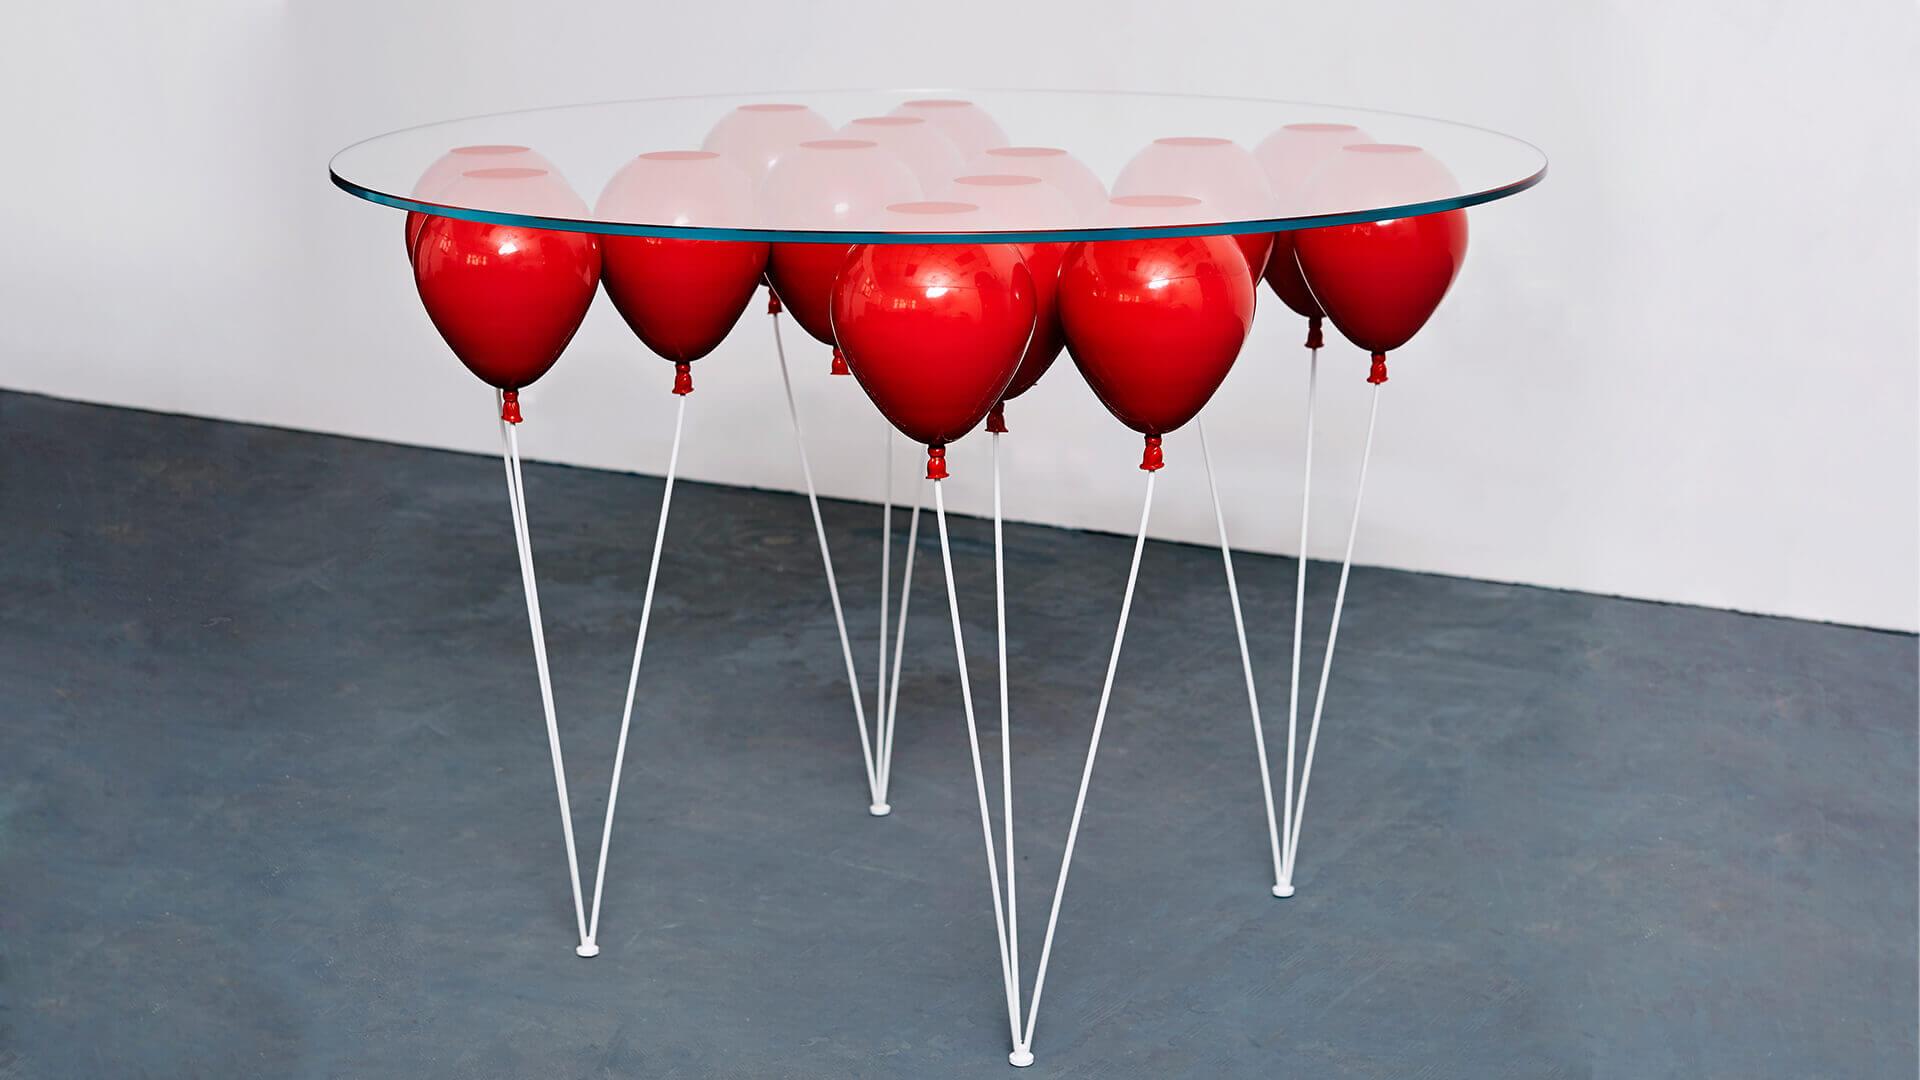 Balloon Dining Round Carousel 05